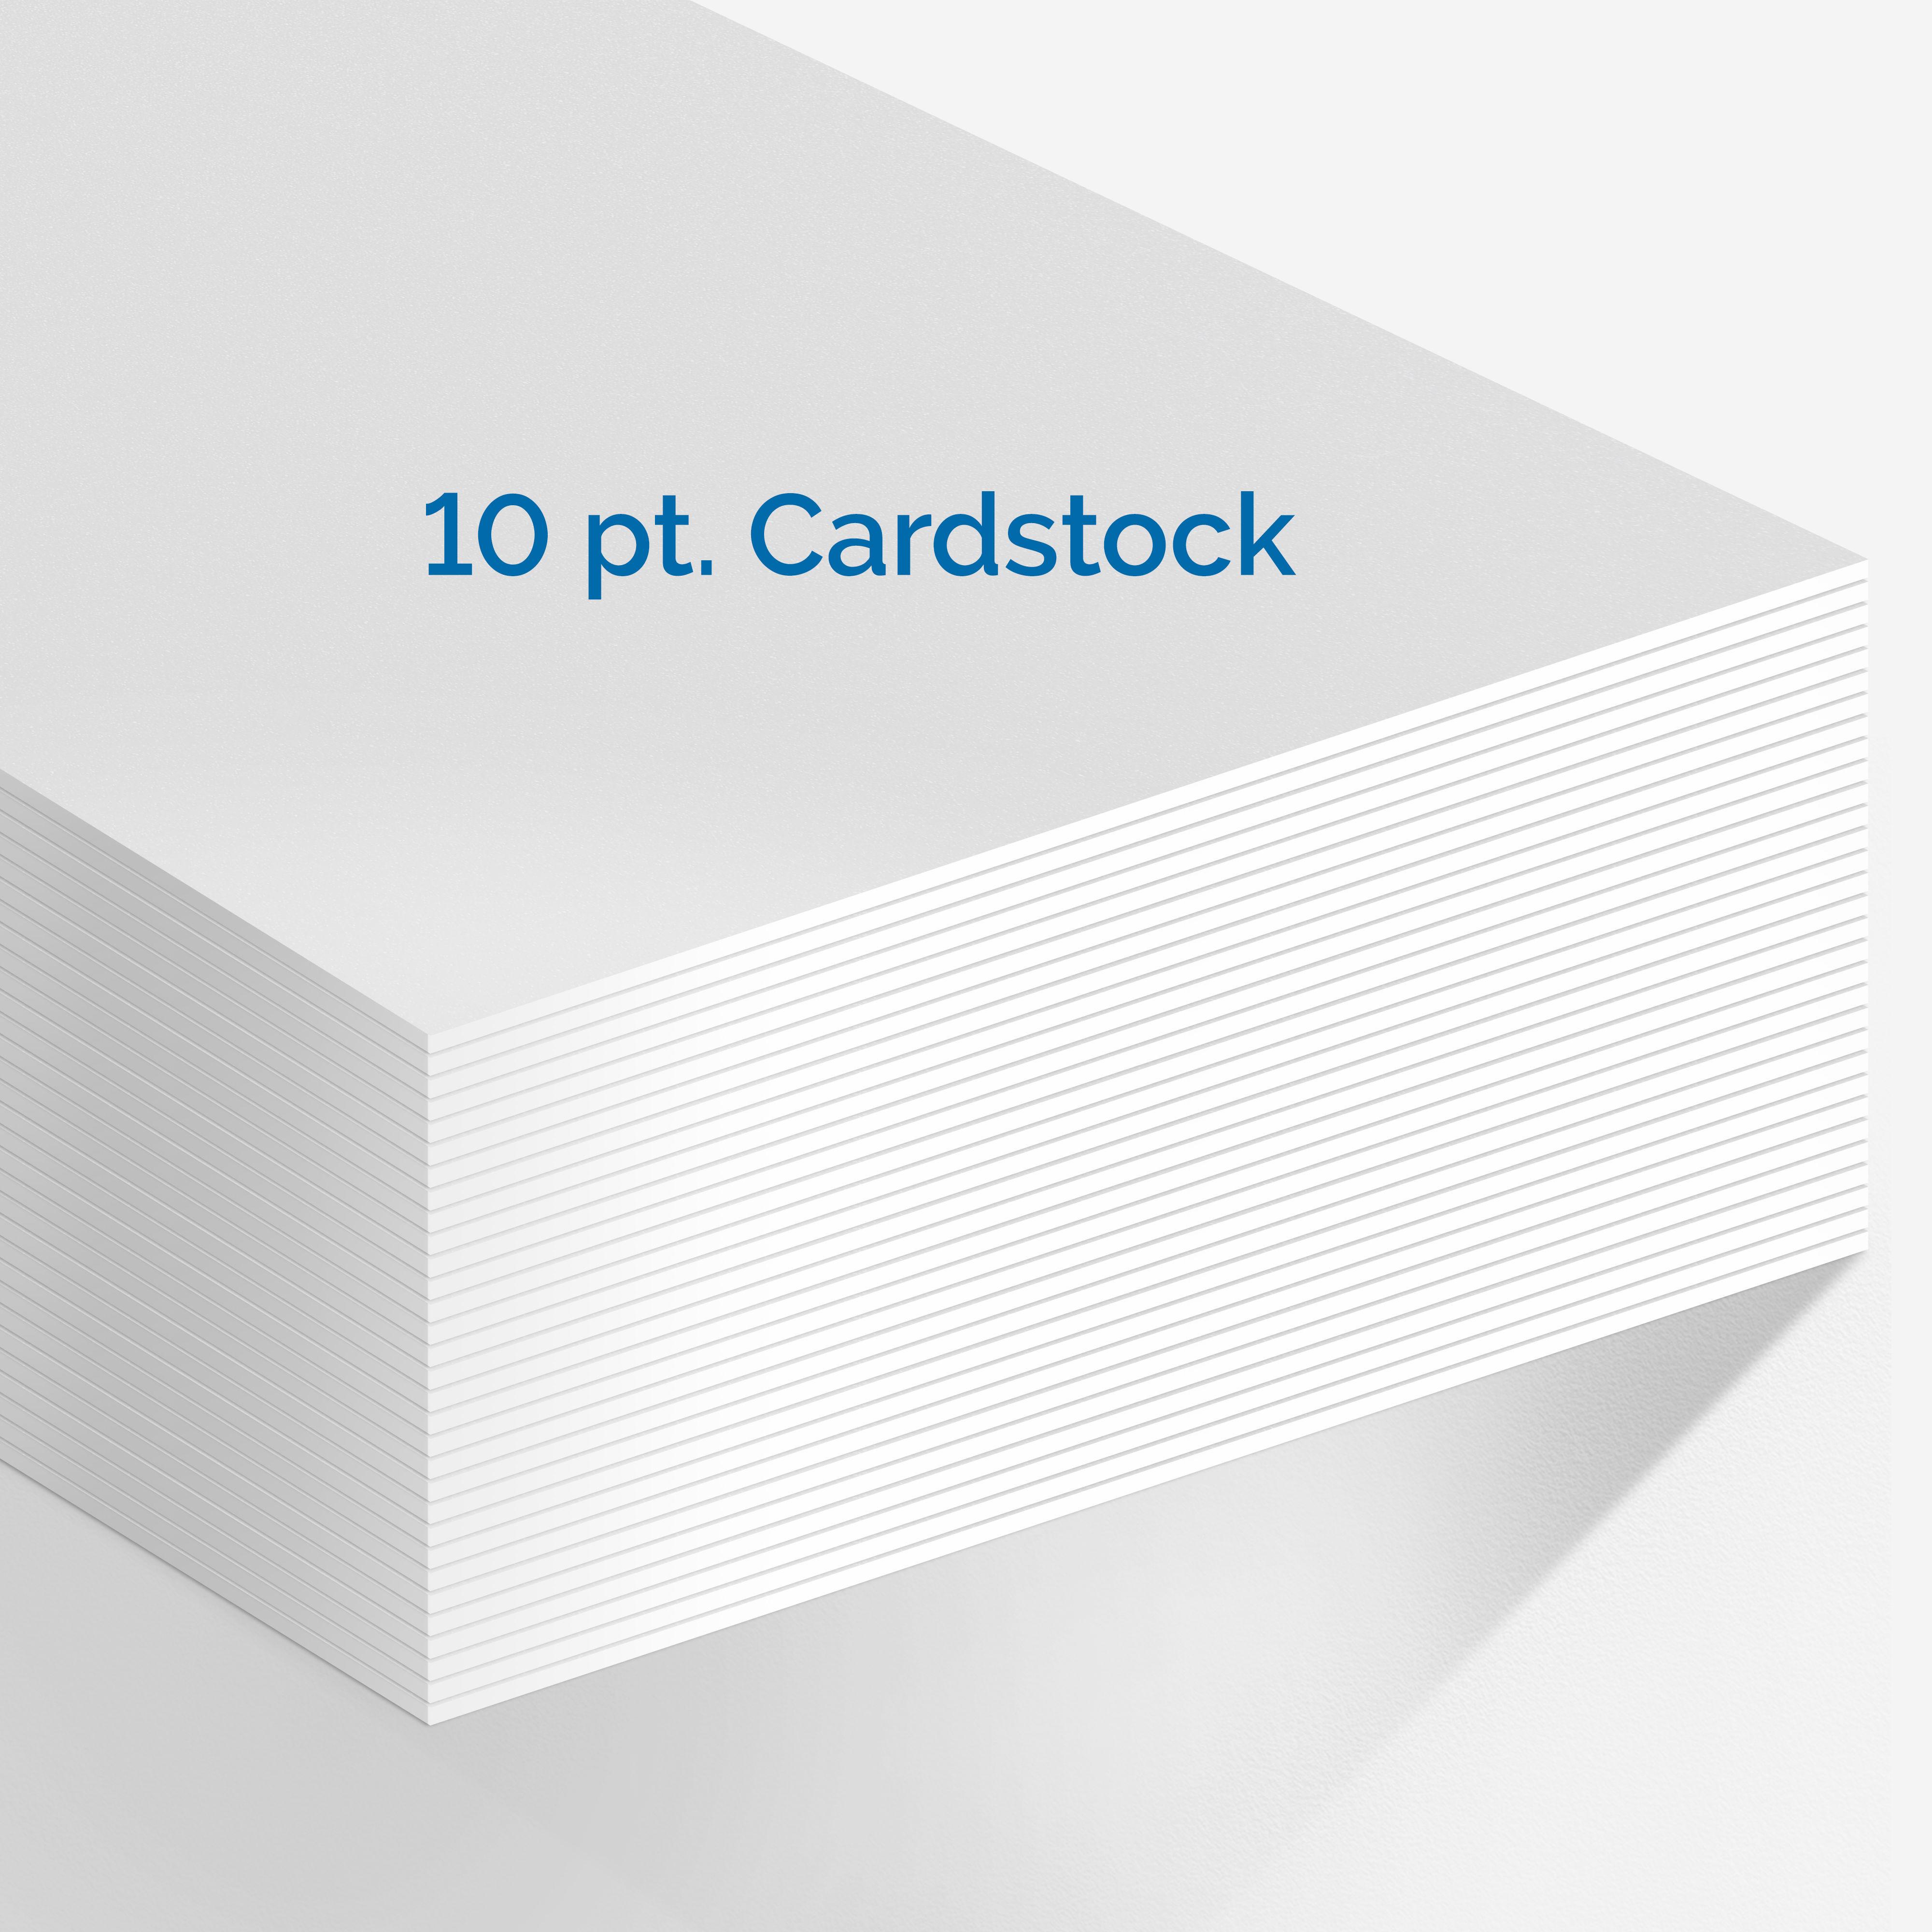 10 Pt Cardstock